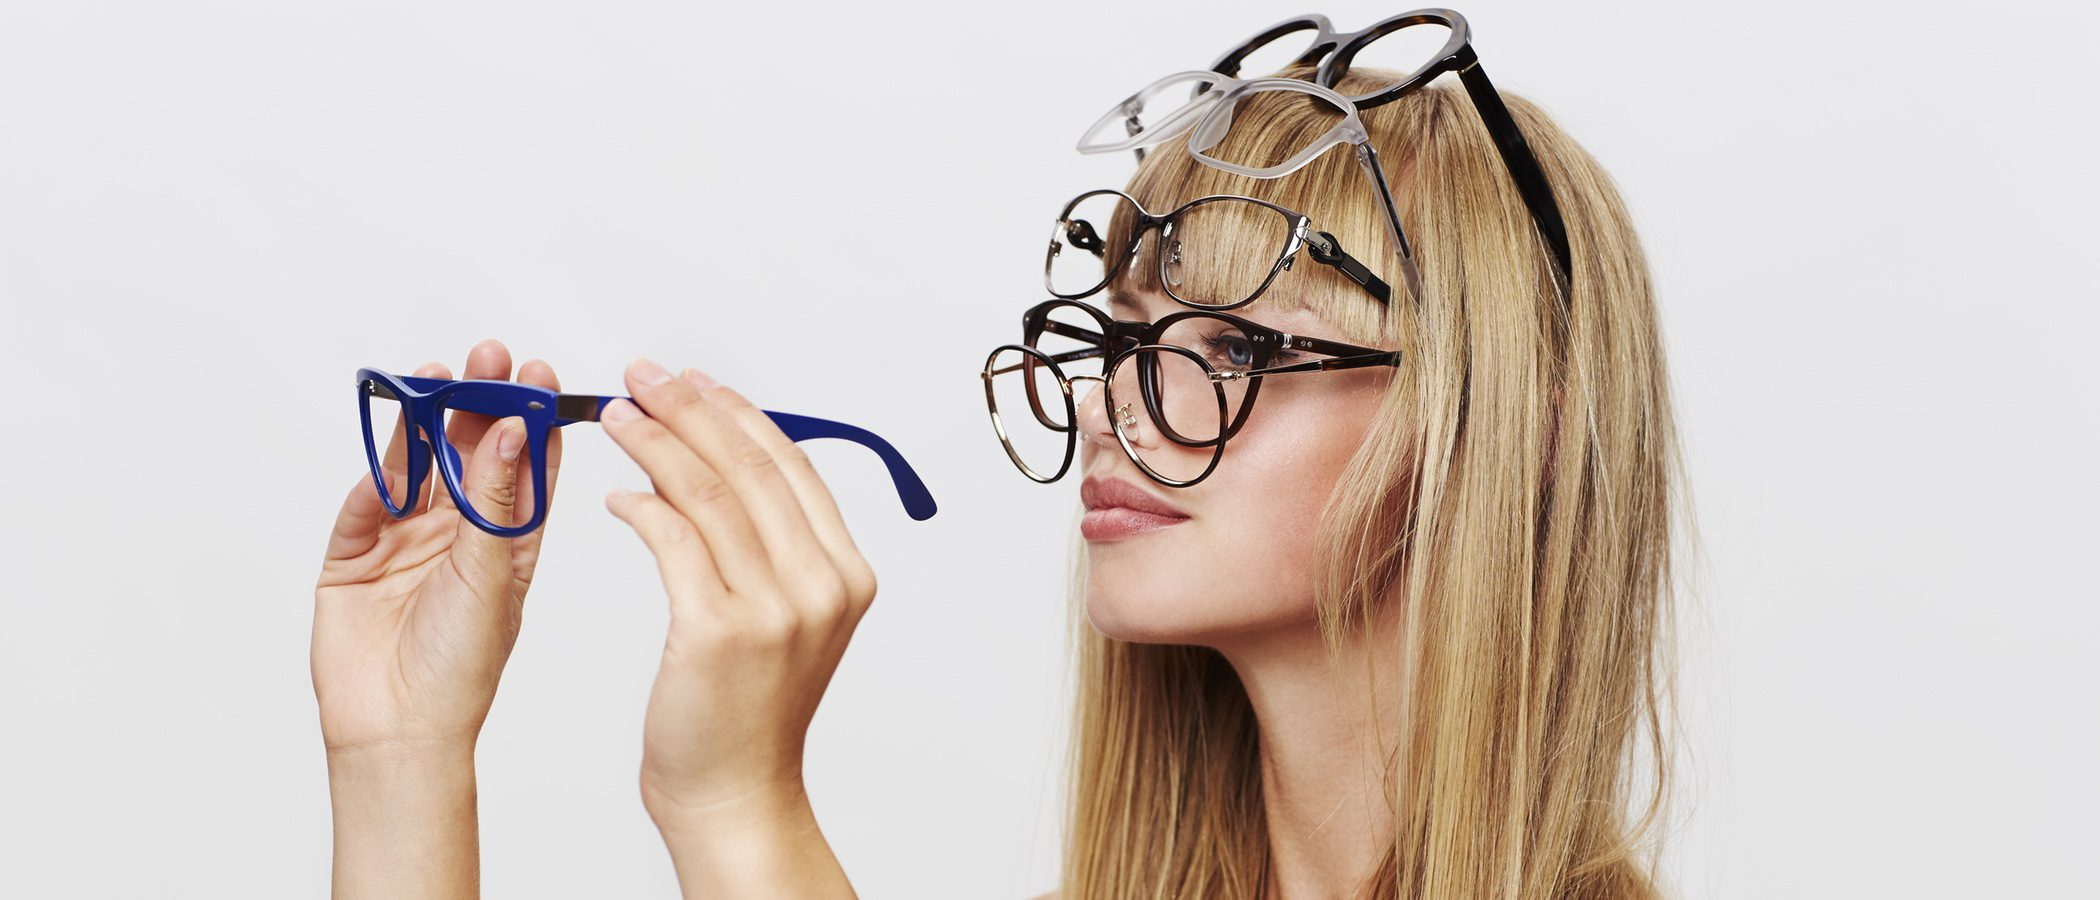 Gafas de pasta: ¿para qué tipos de cara? - Bekia Moda